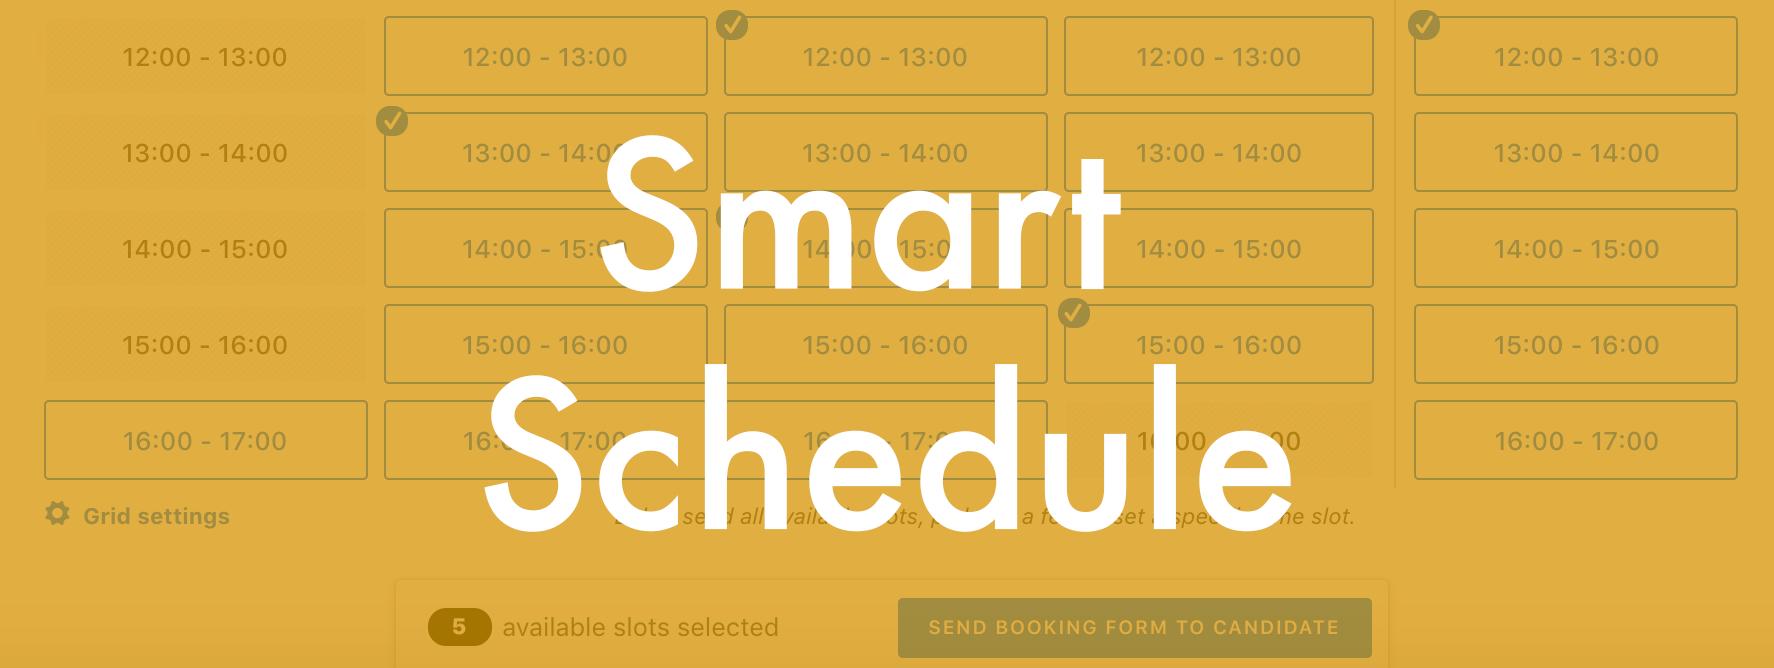 smart schedule blog header-1